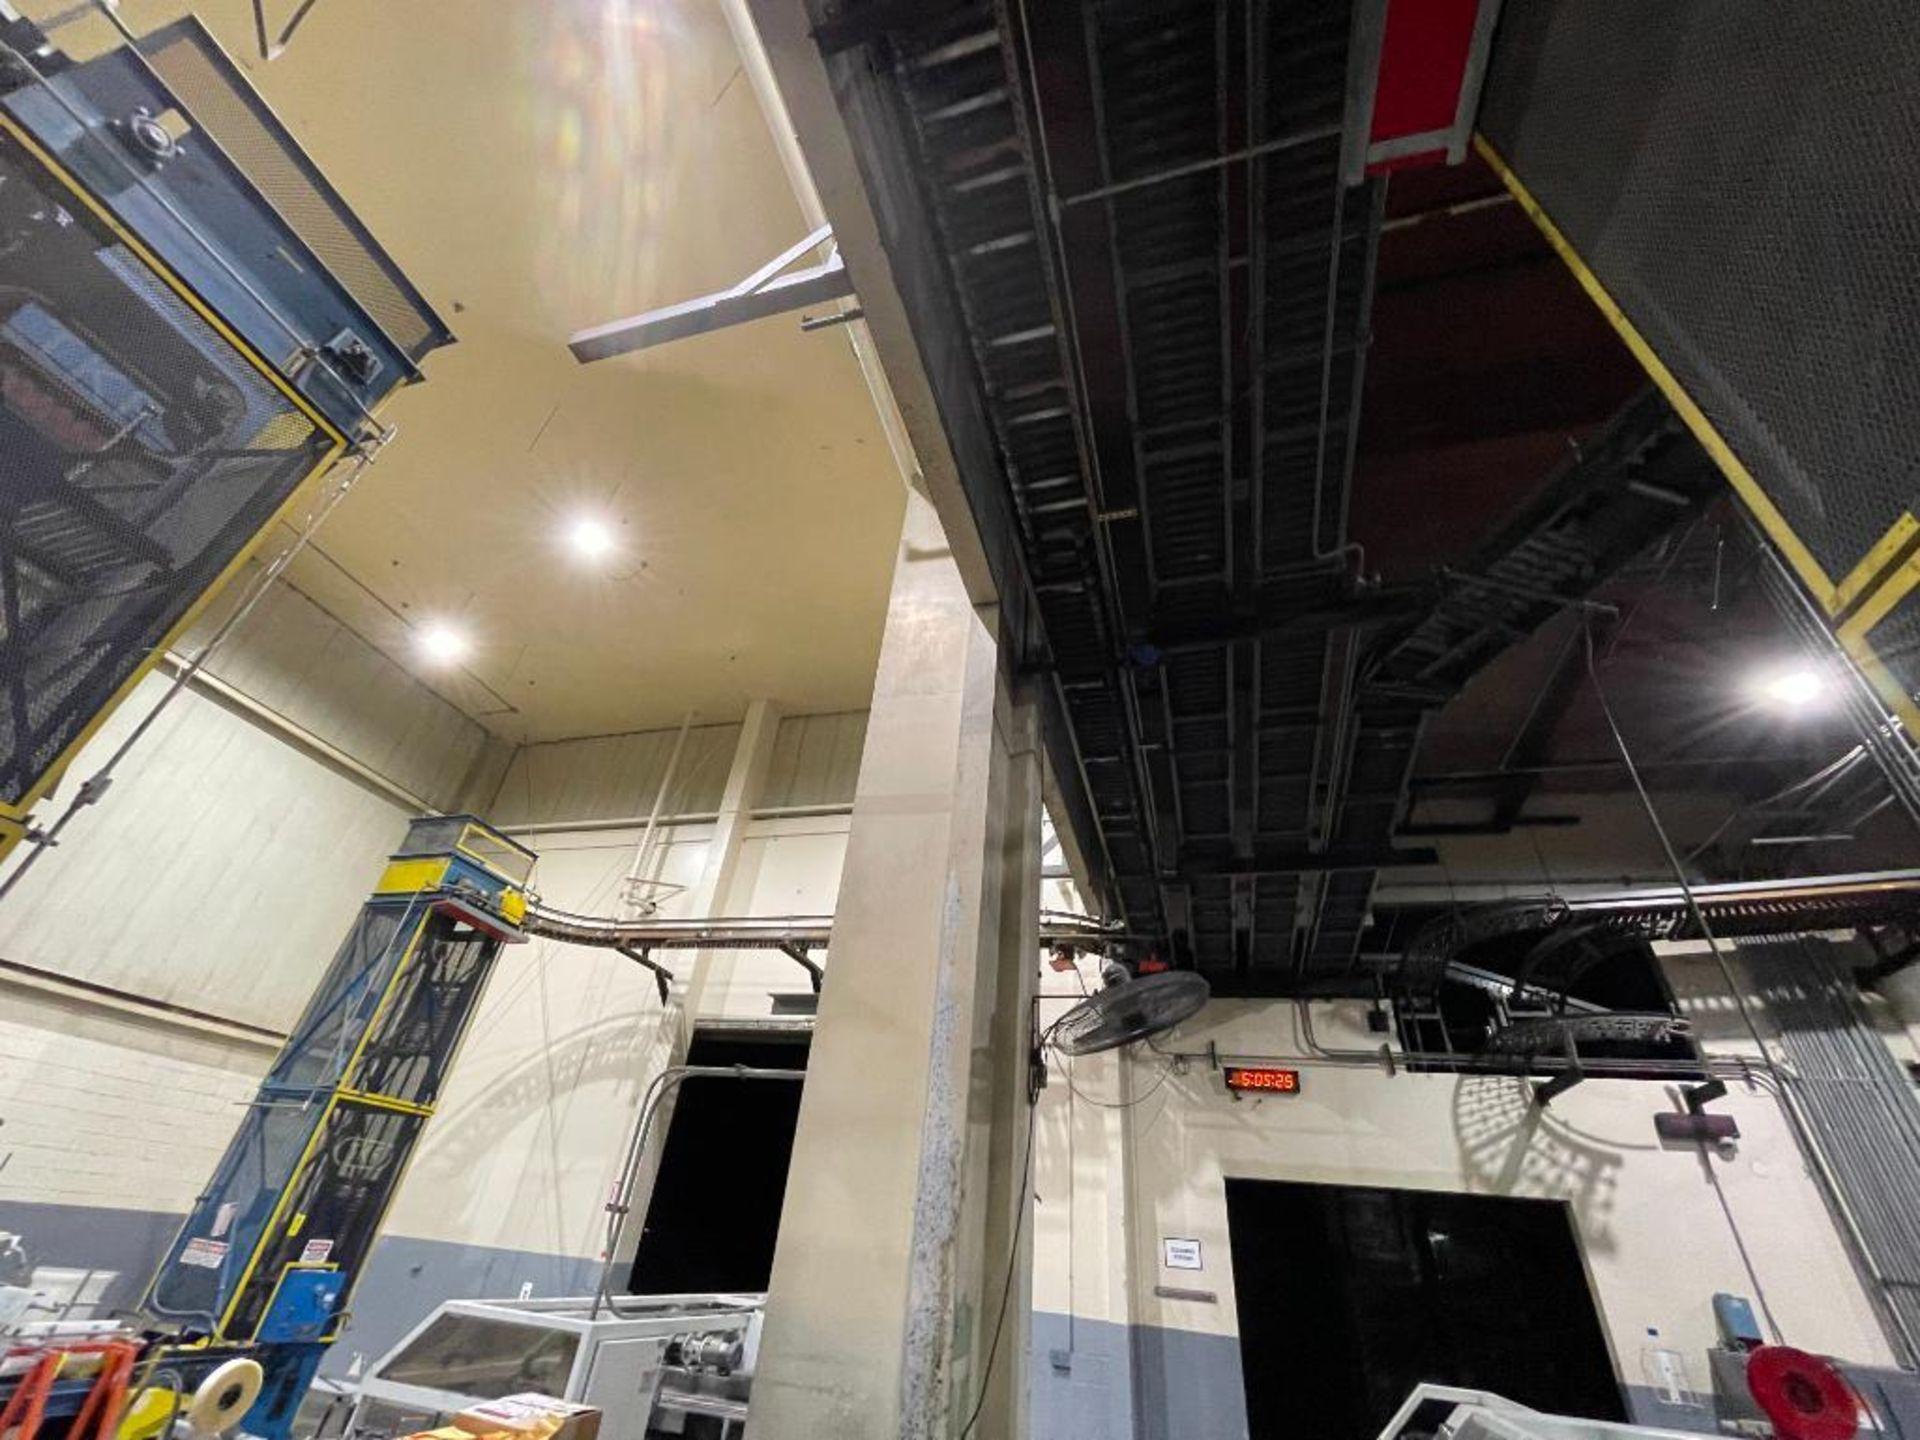 overhead power case conveyor - Image 4 of 5